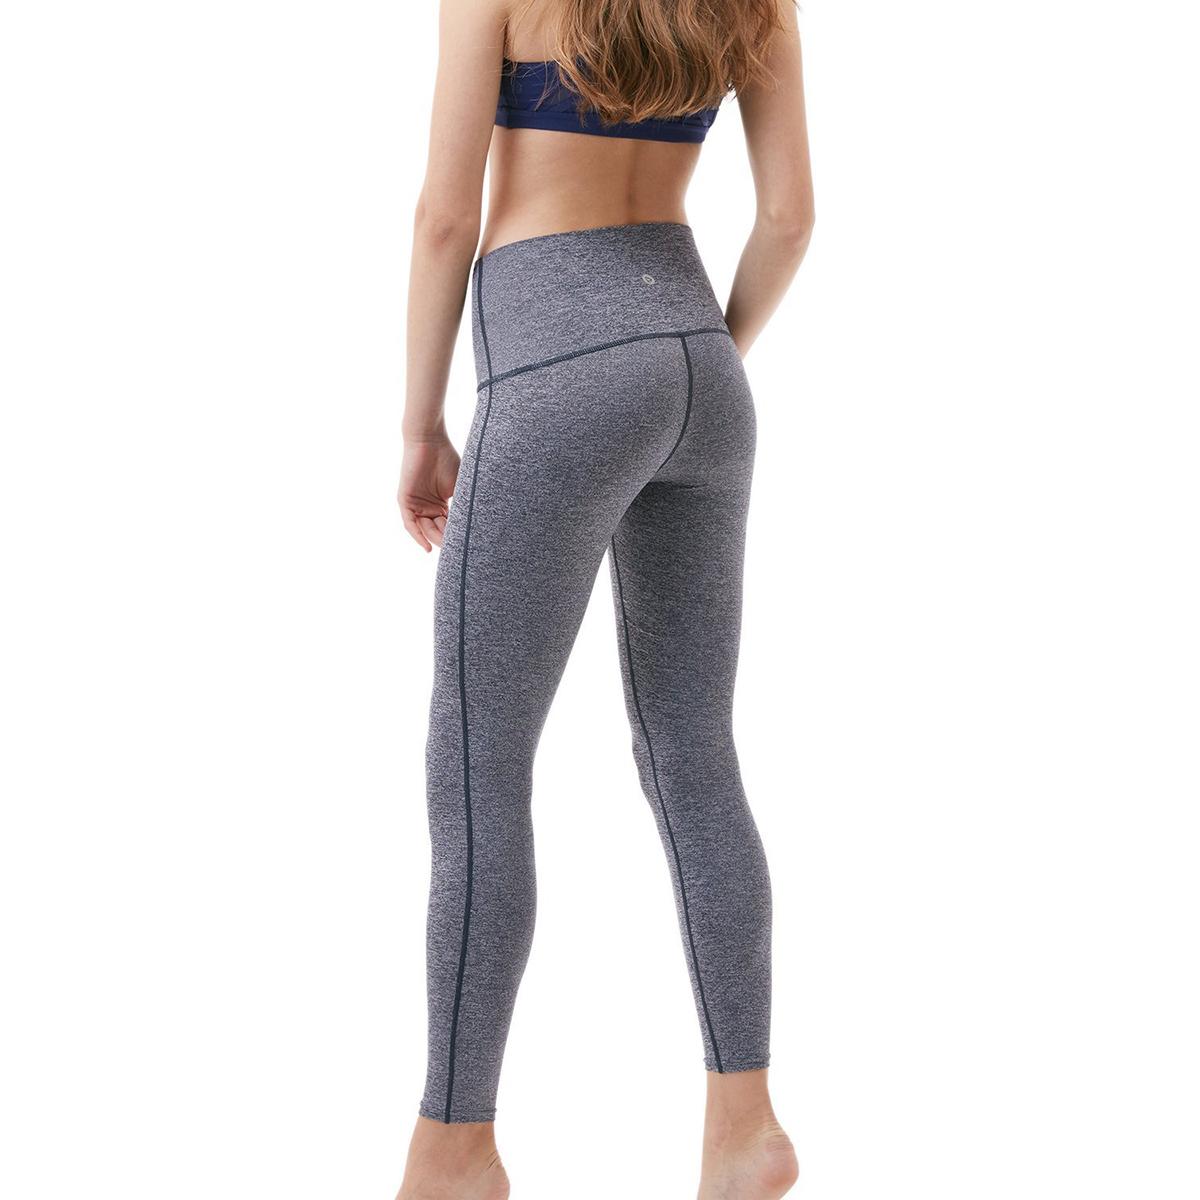 thumbnail 87 - TSLA Tesla FYP42 Women's High-Waisted Ultra-Stretch Tummy Control Yoga Pants